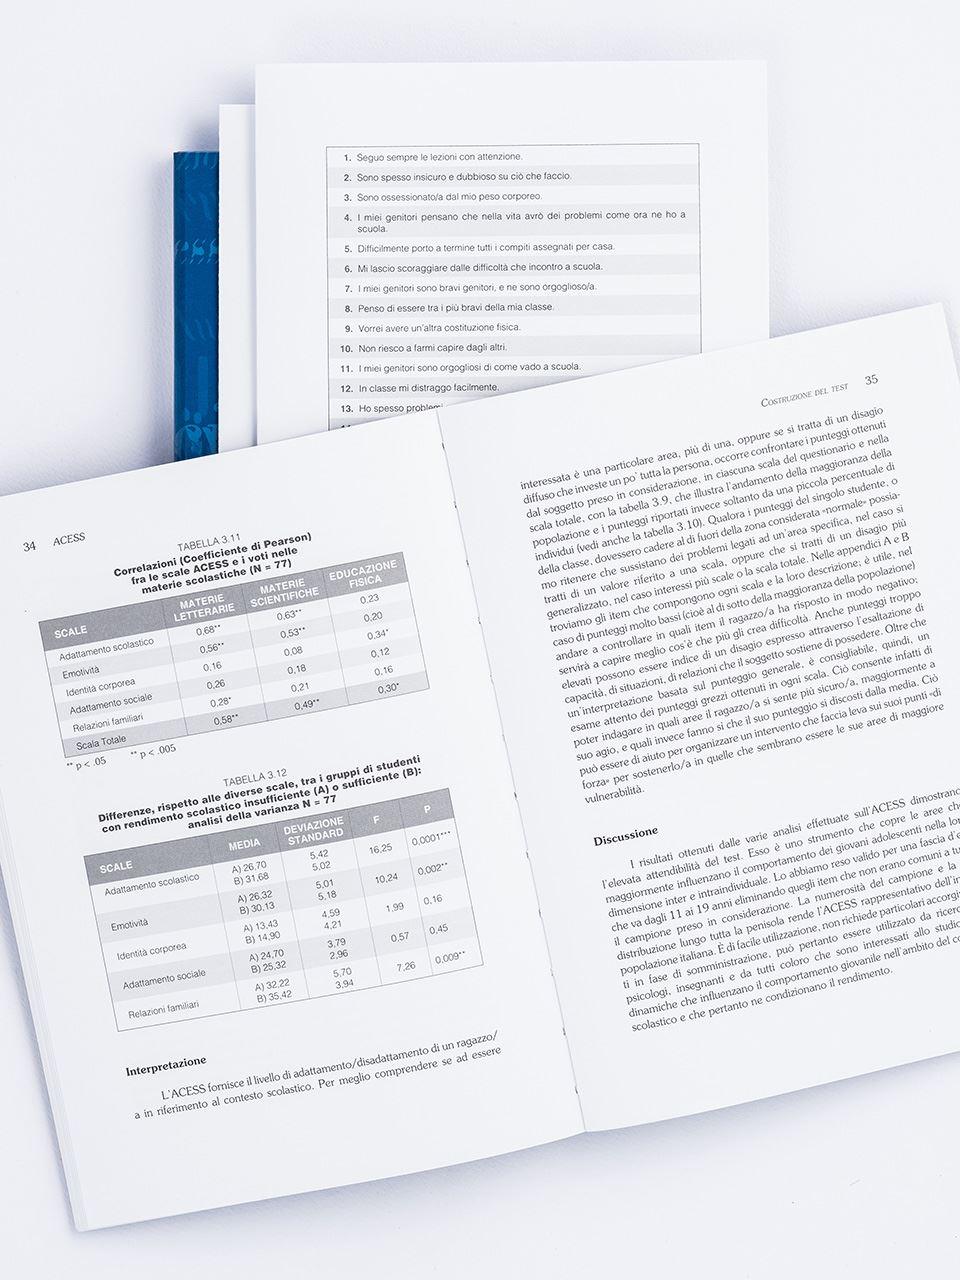 Test ACESS - Analisi degli indicatori cognitivo-em - Libri - Strumenti - Erickson 2